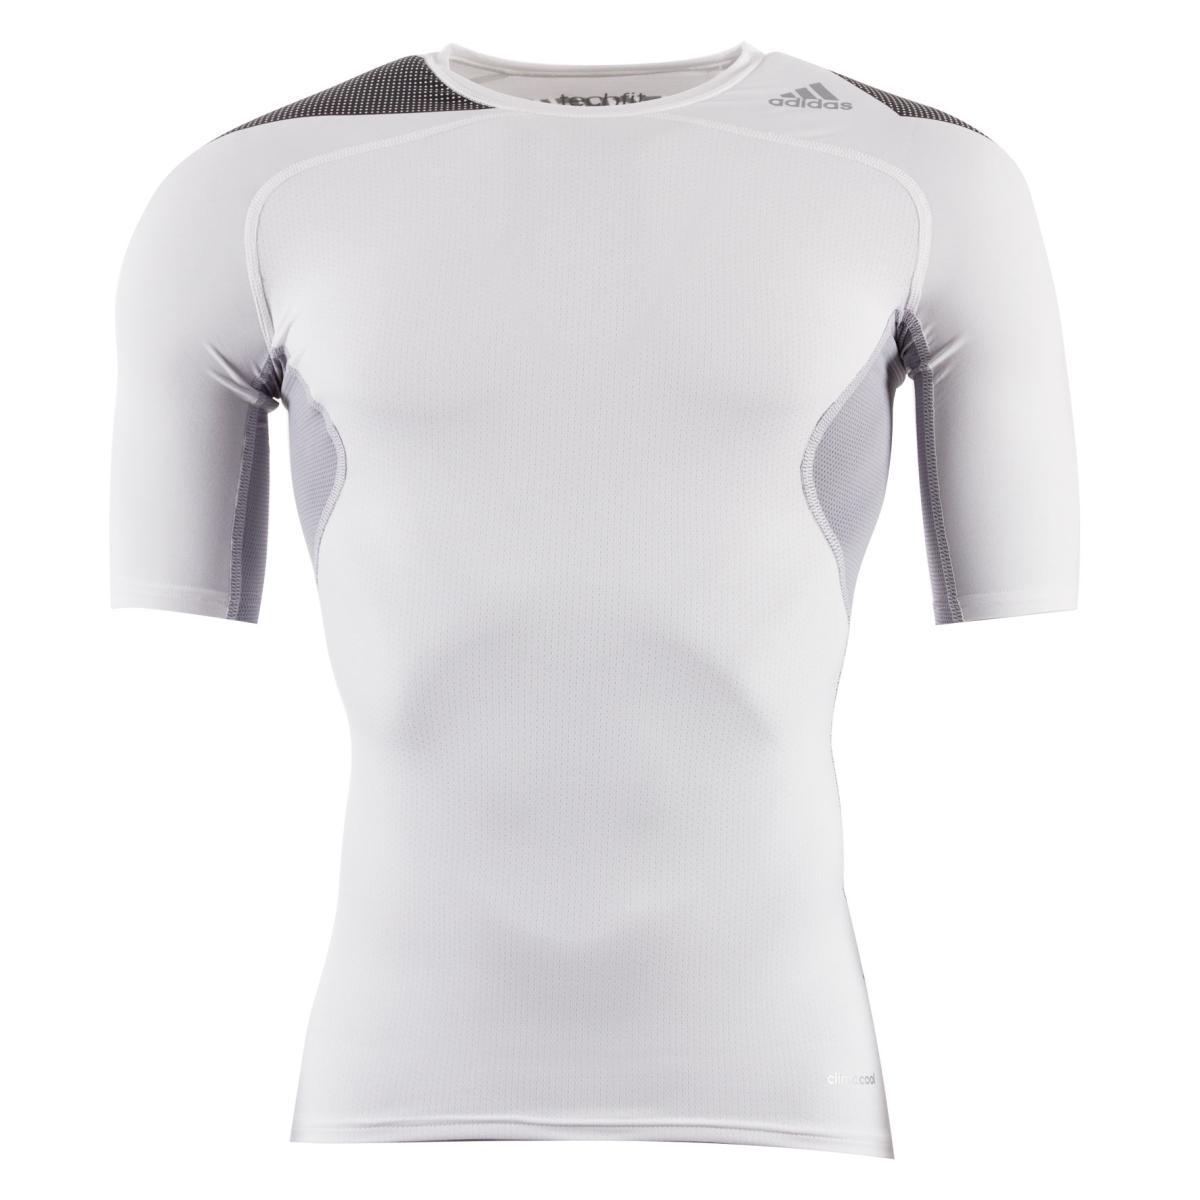 4a9aafa8af0c White adidas Techfit Cool Tee (Short Sleeved)